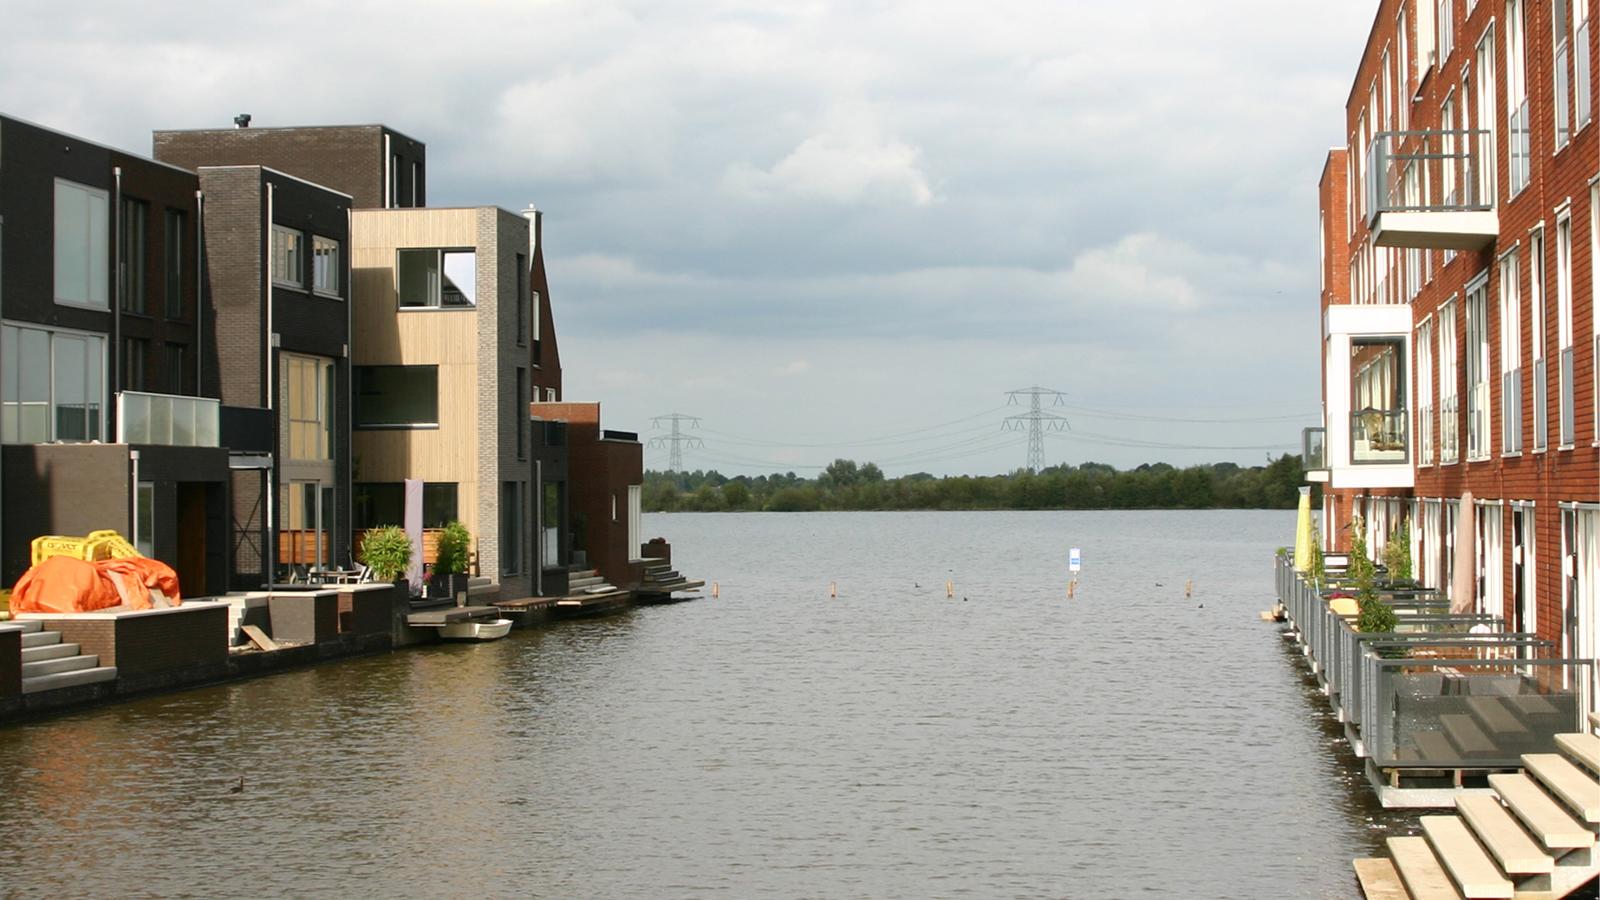 Meerveld architectuur